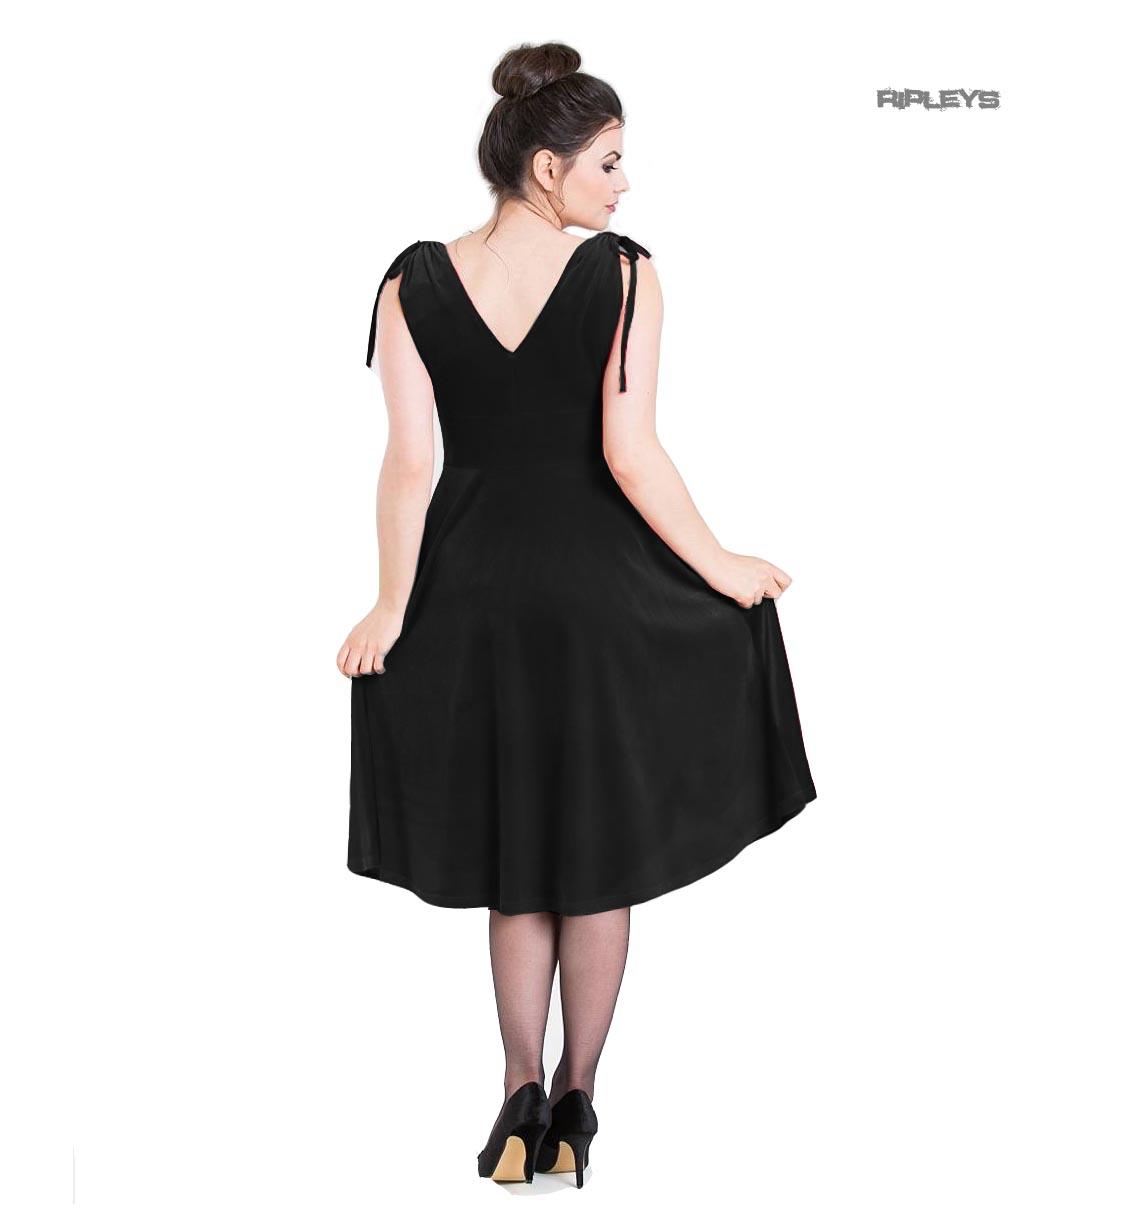 Hell-Bunny-40s-50s-Elegant-Pin-Up-Dress-MELINA-Crushed-Velvet-Black-All-Sizes thumbnail 20